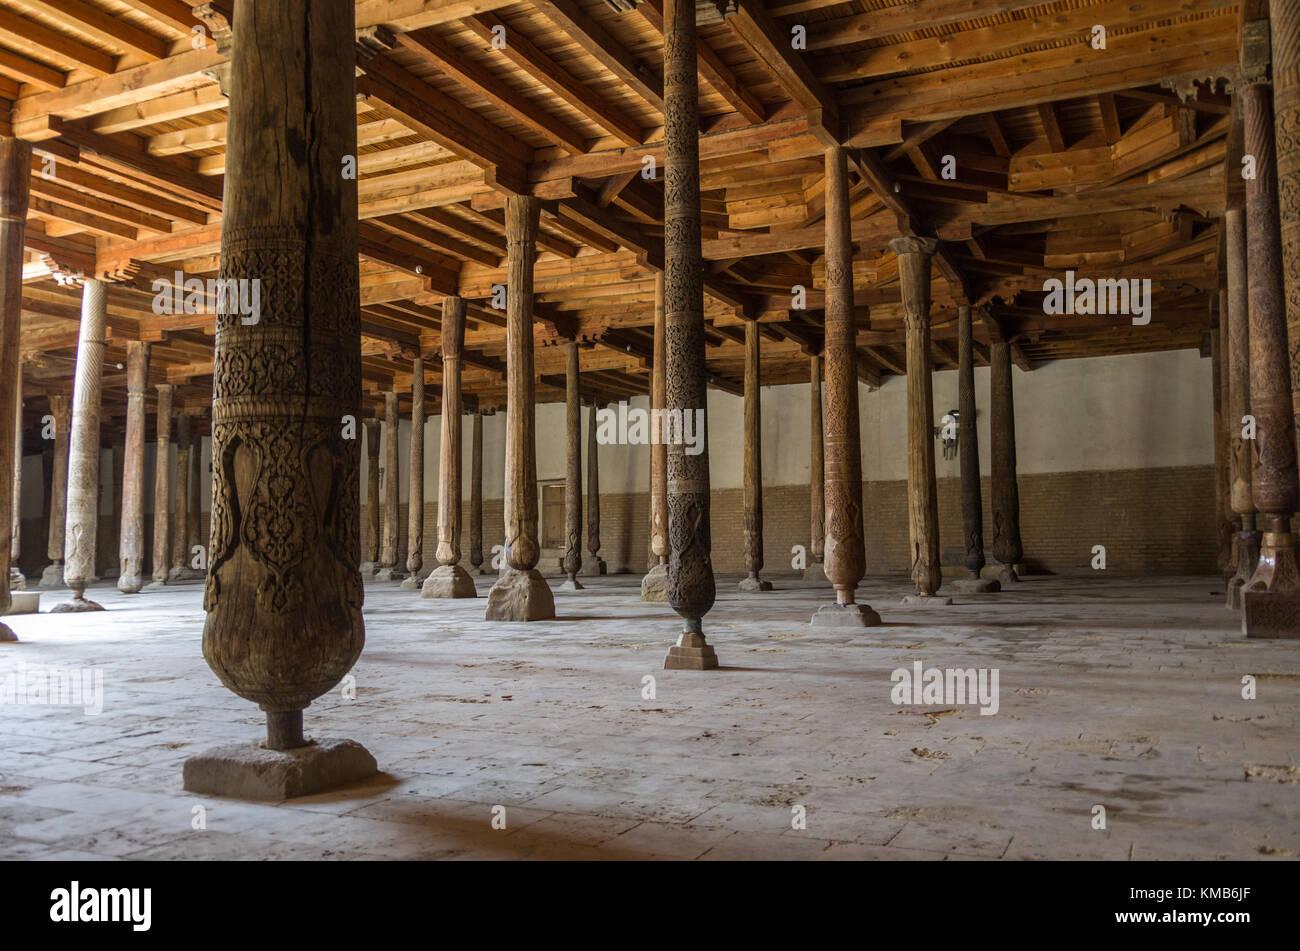 Khiva, Uzbekistan, April 30, 2015:  Interior of the Juma Mosque. - Stock Image